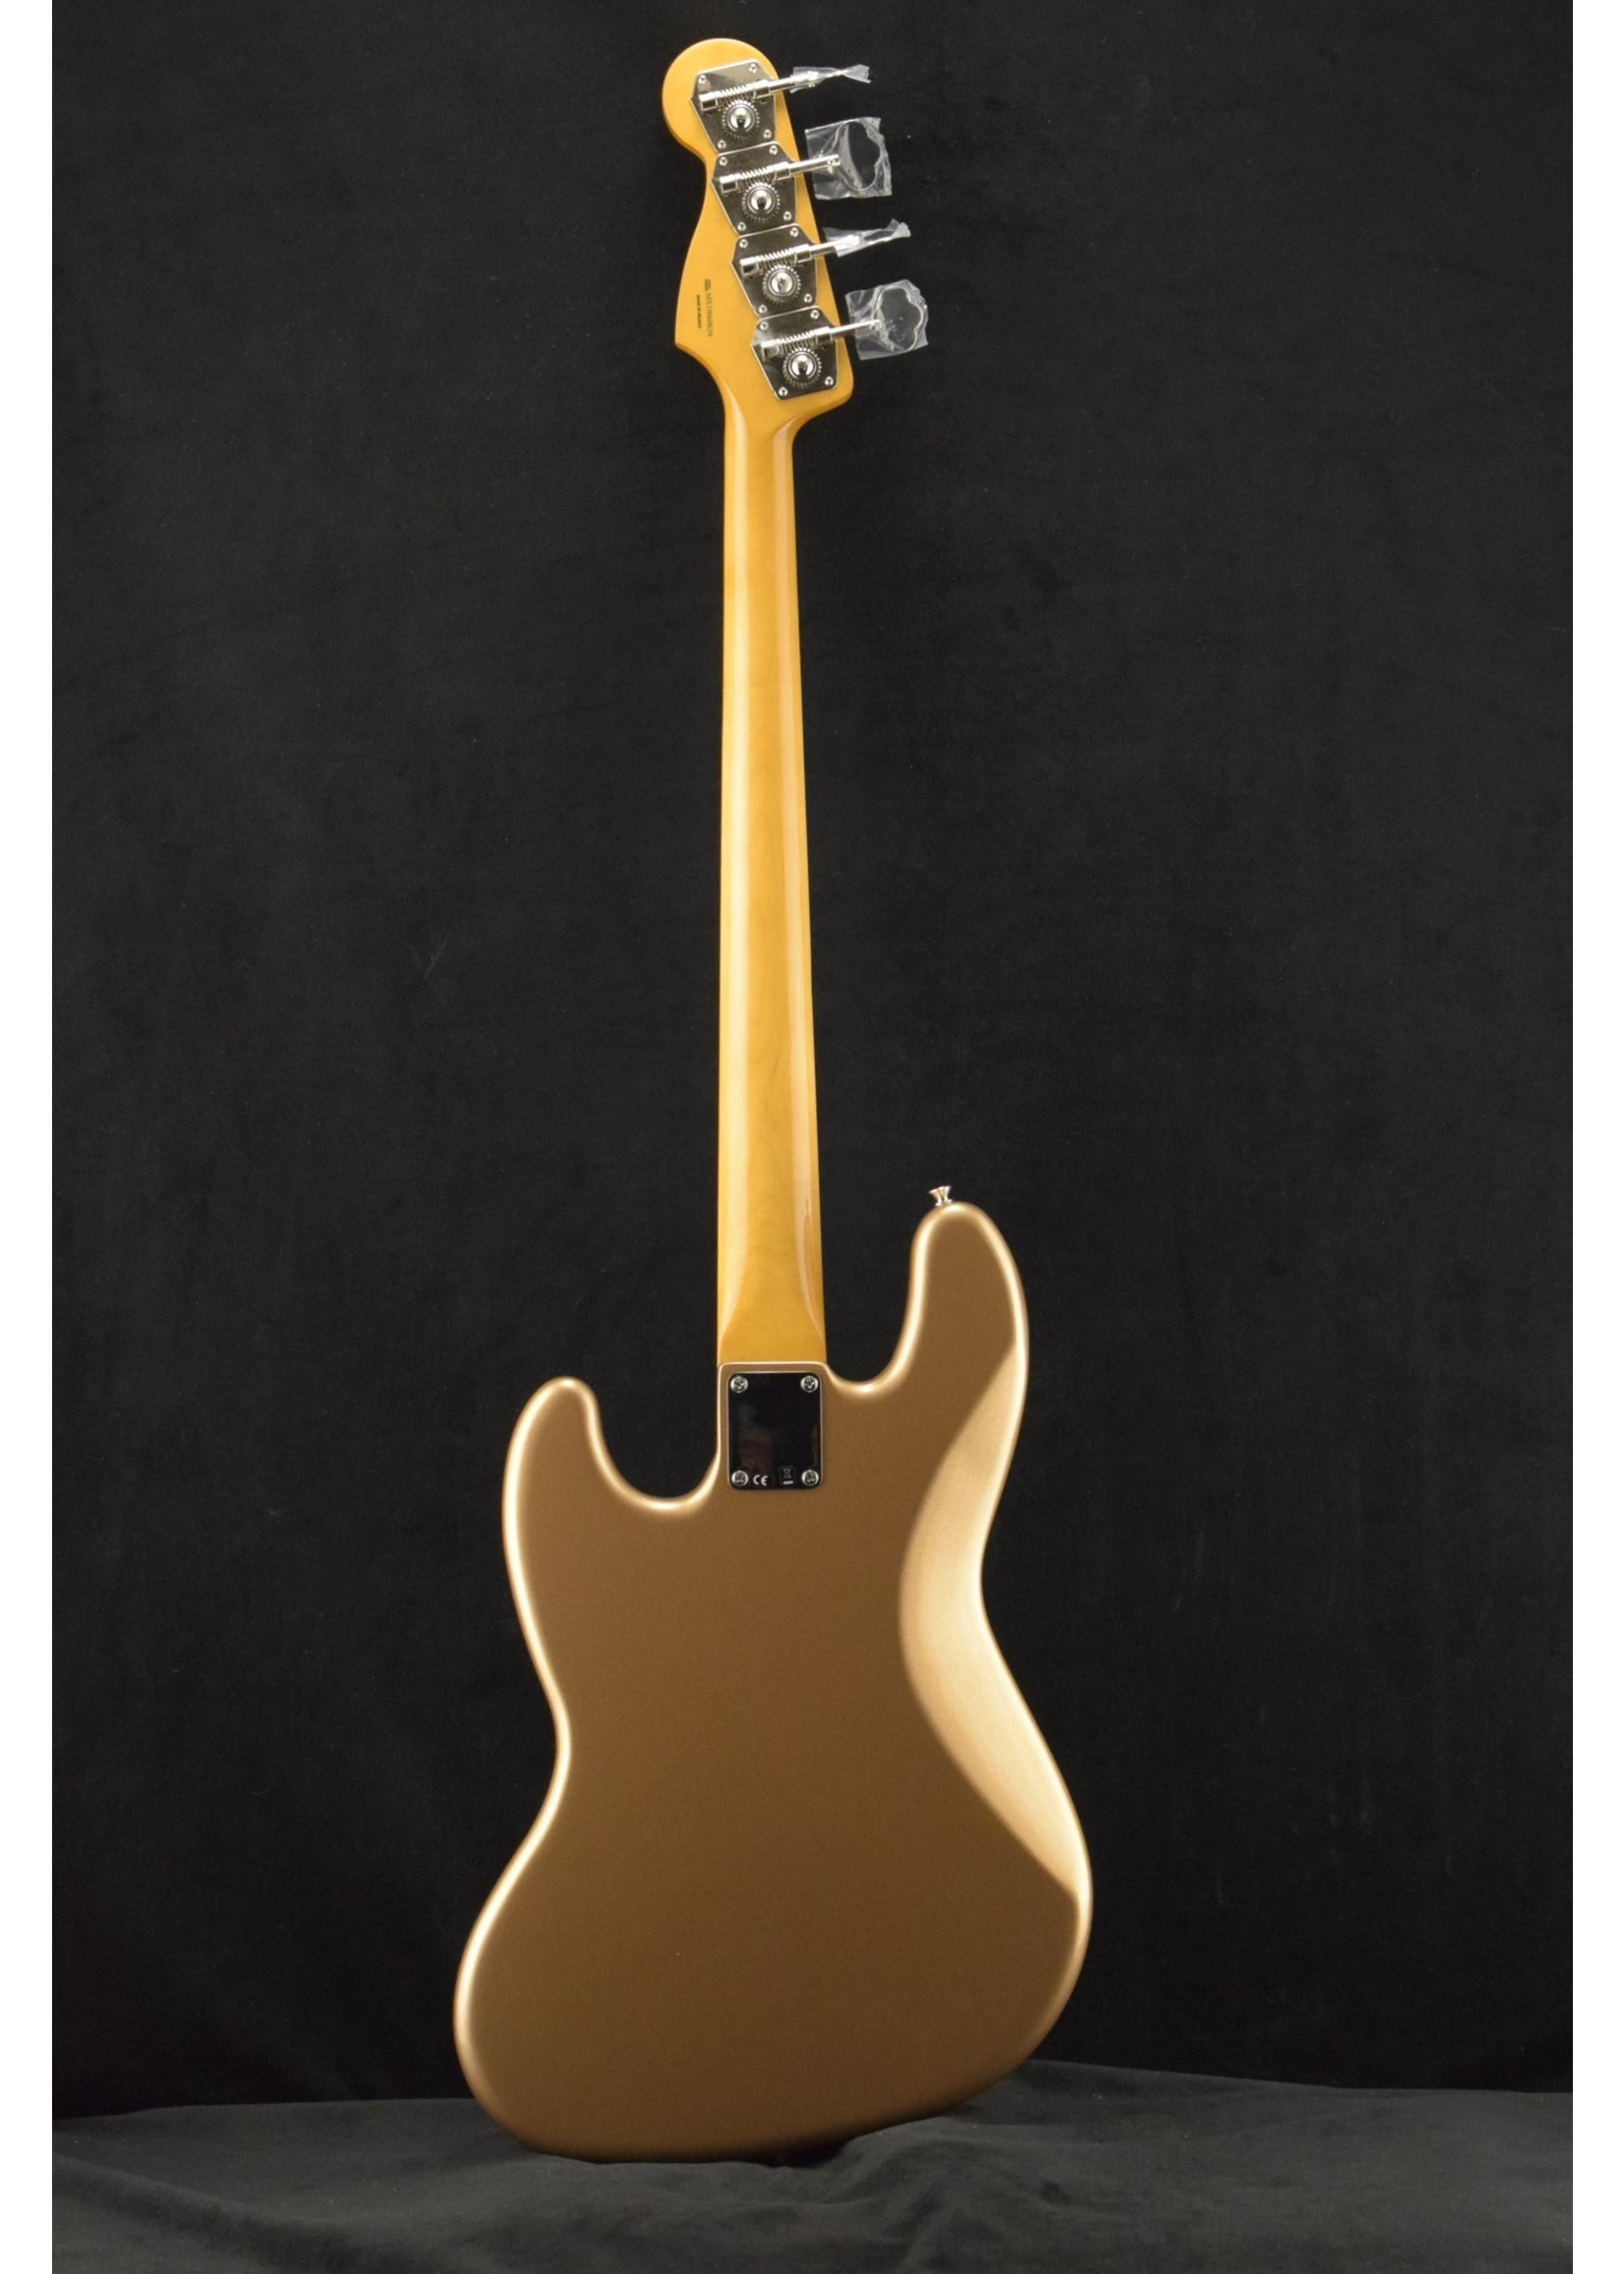 Fender Fender Vintera '60s Jazz Bass Firemist Gold